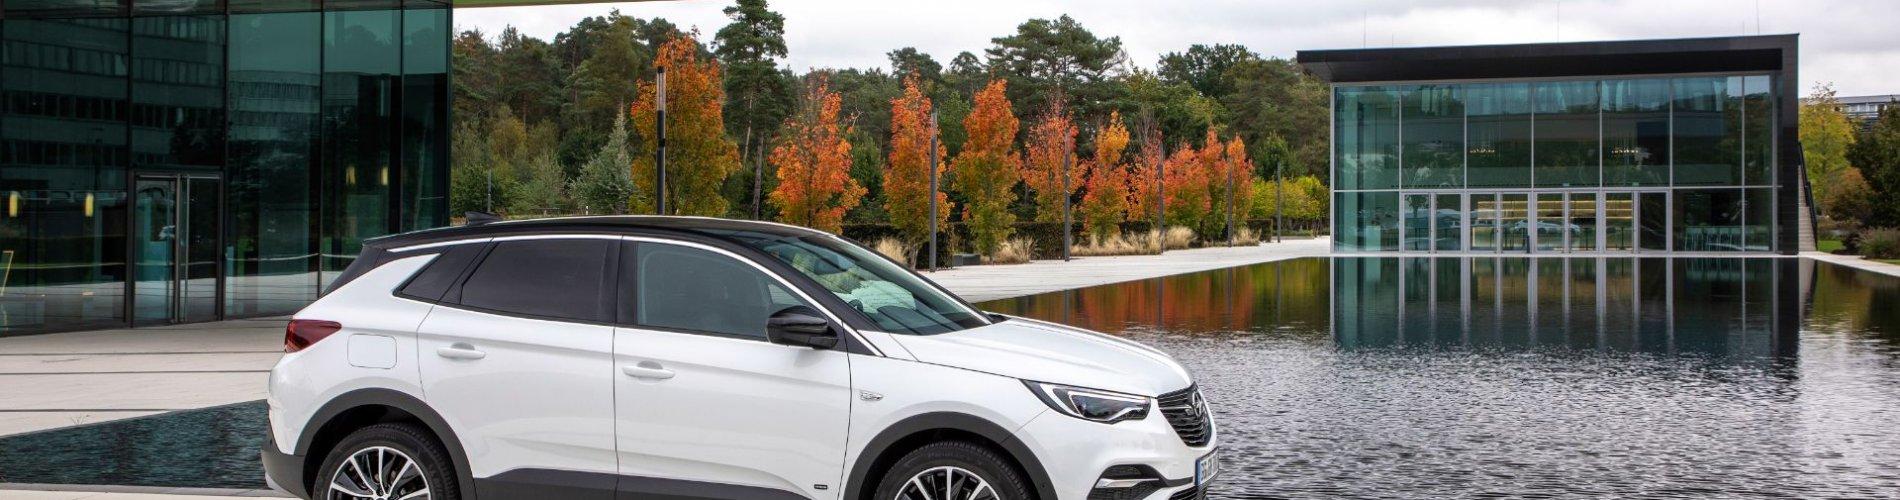 Opel Grandland X Hybrid 2020 front